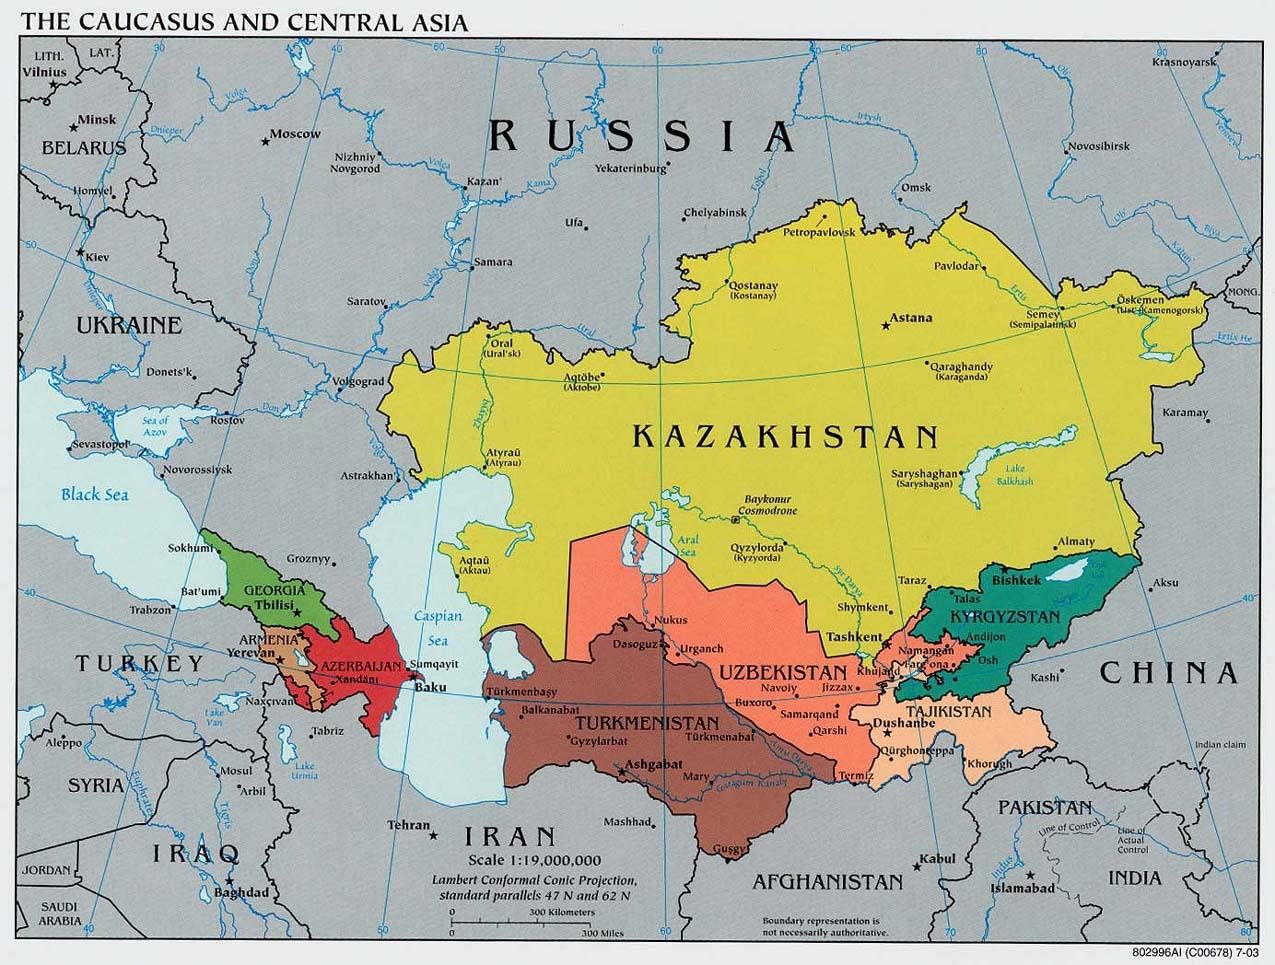 Landkarte Asien.Landkarte Kaukasus Zentralasien Ubersichtskarte